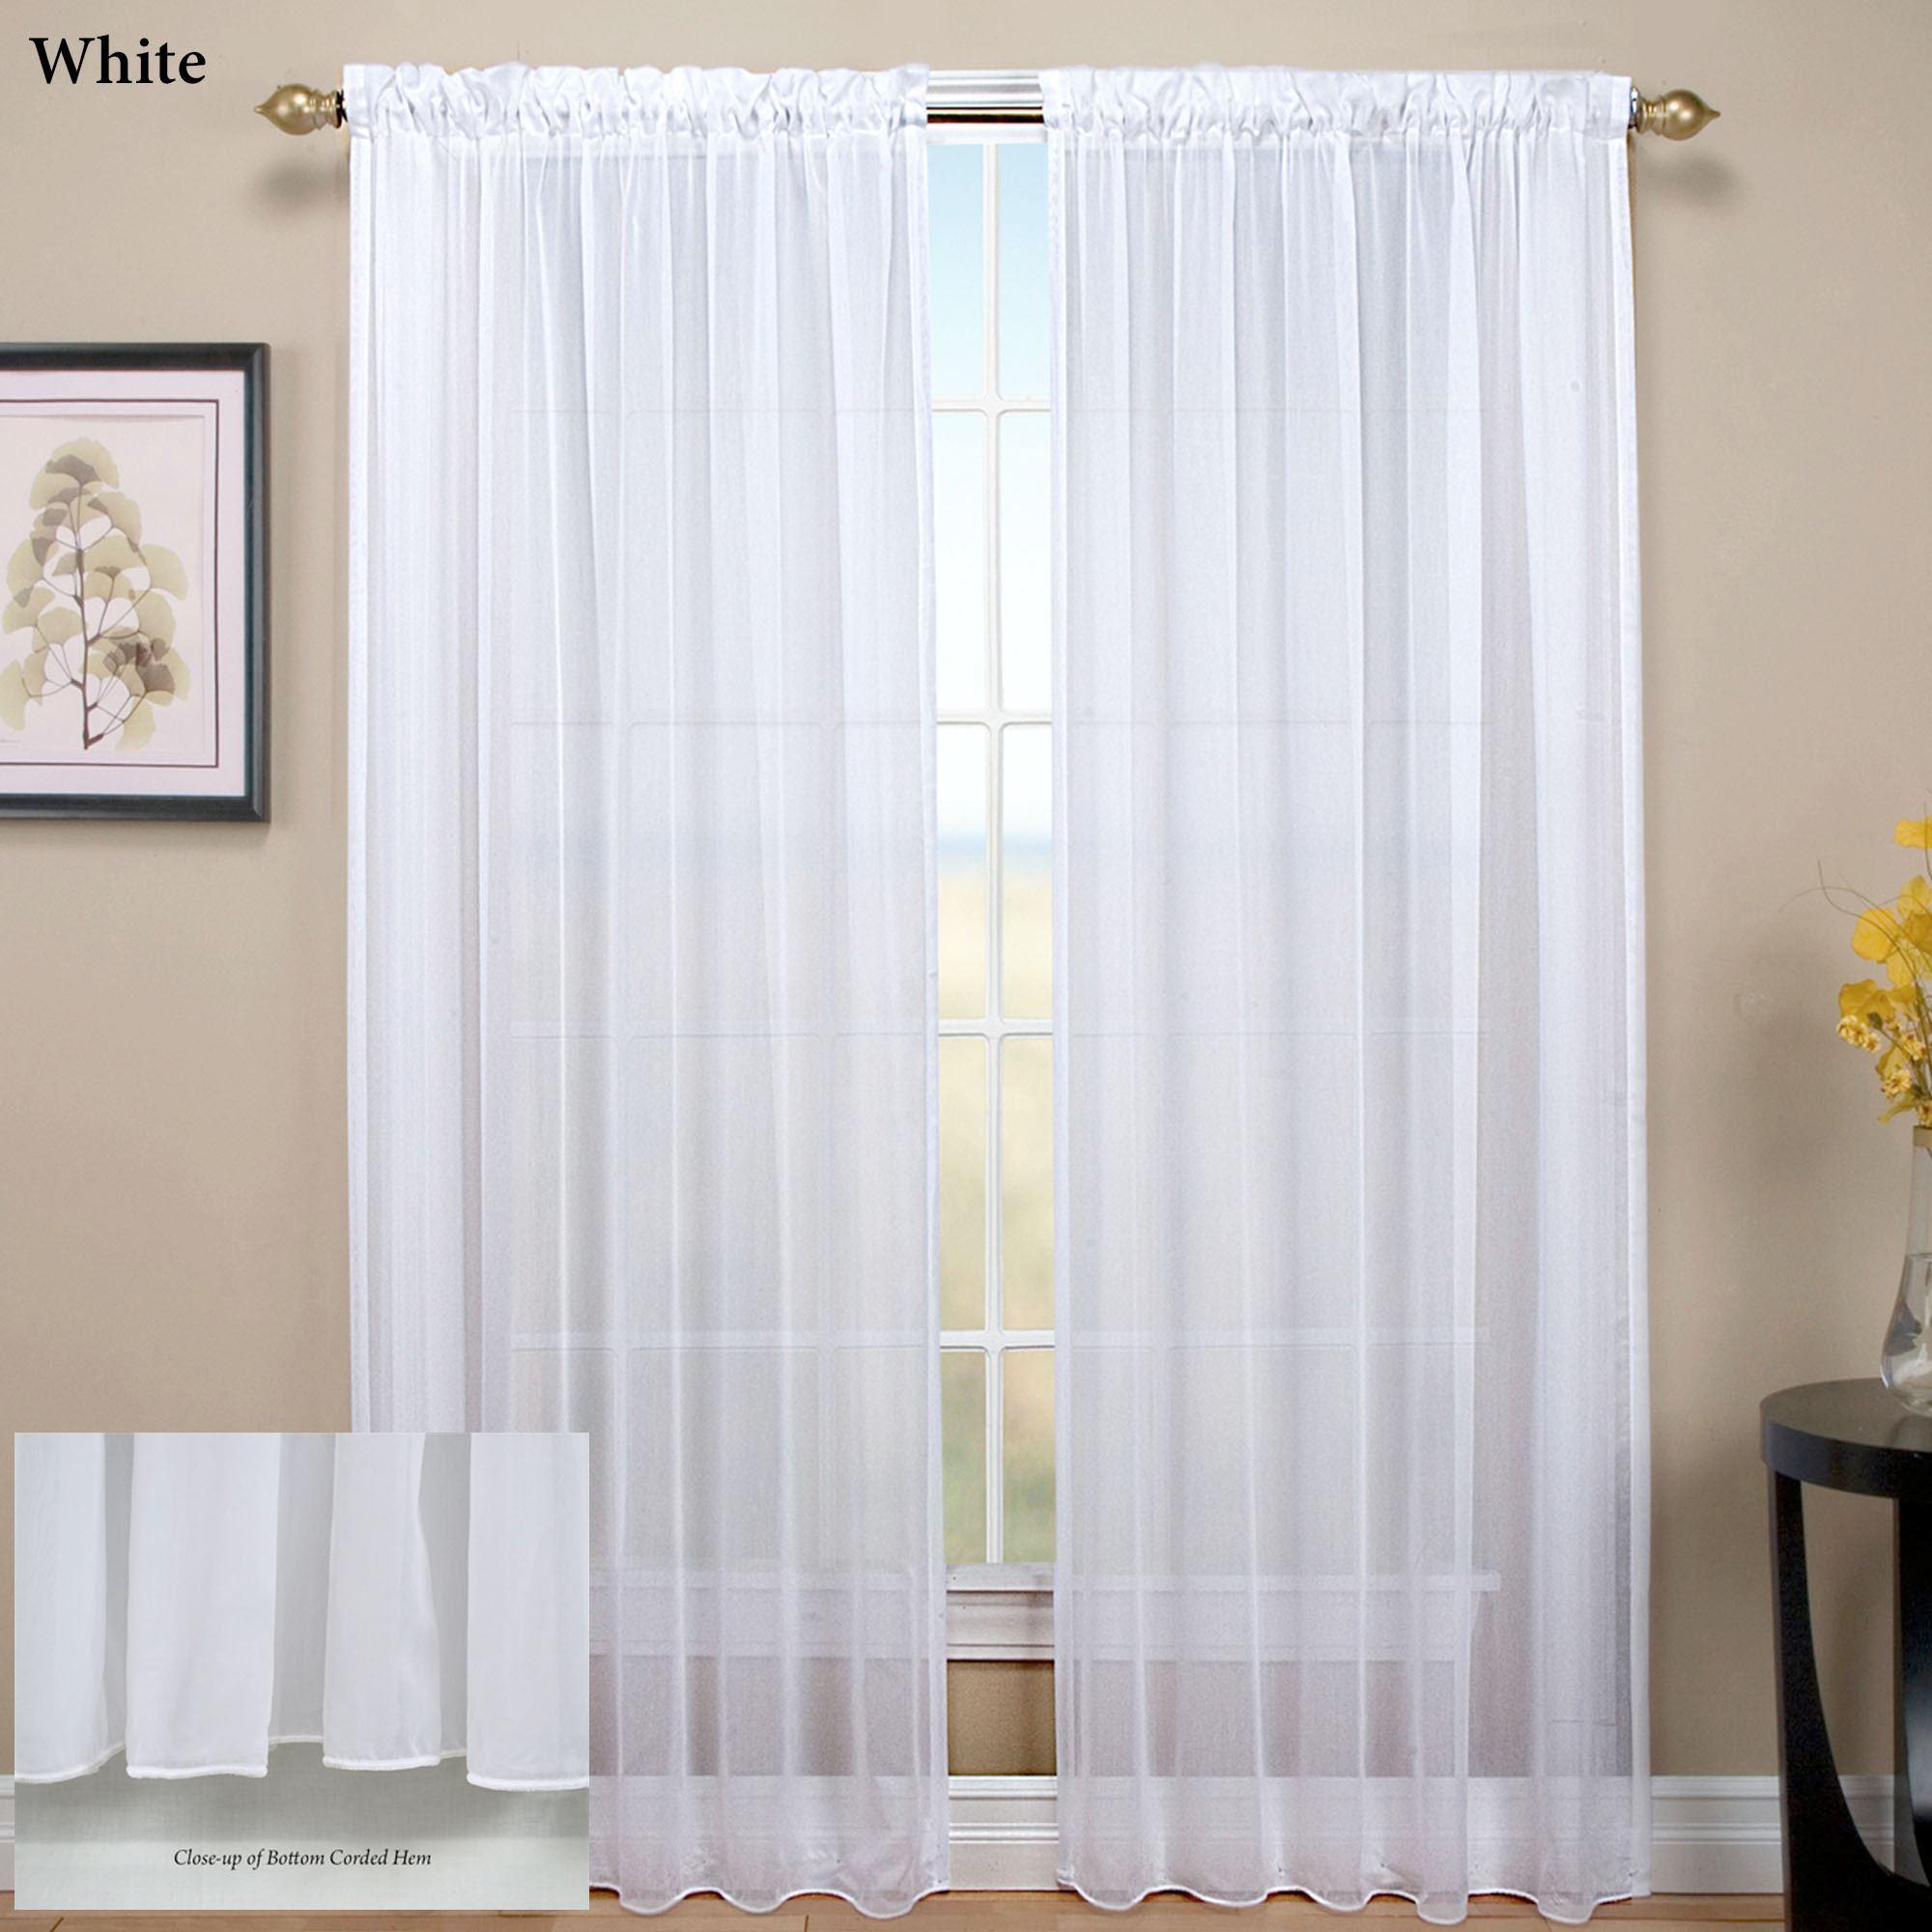 Sheer Curtain tergaline sheer curtain panel BLUQXBR